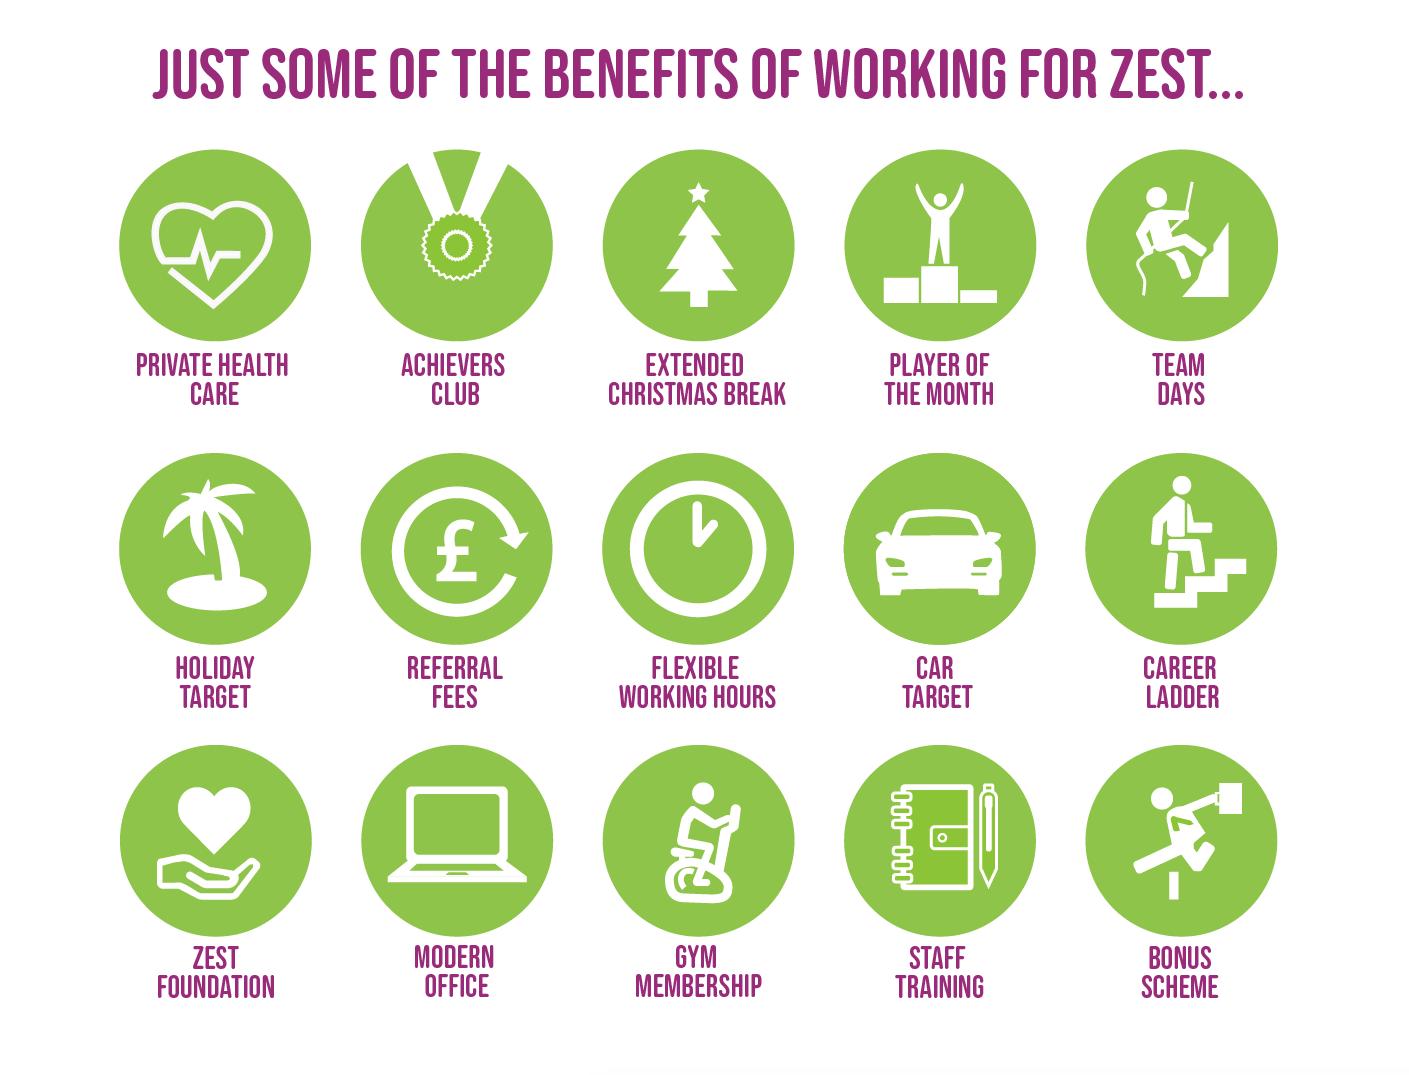 Work for Zest